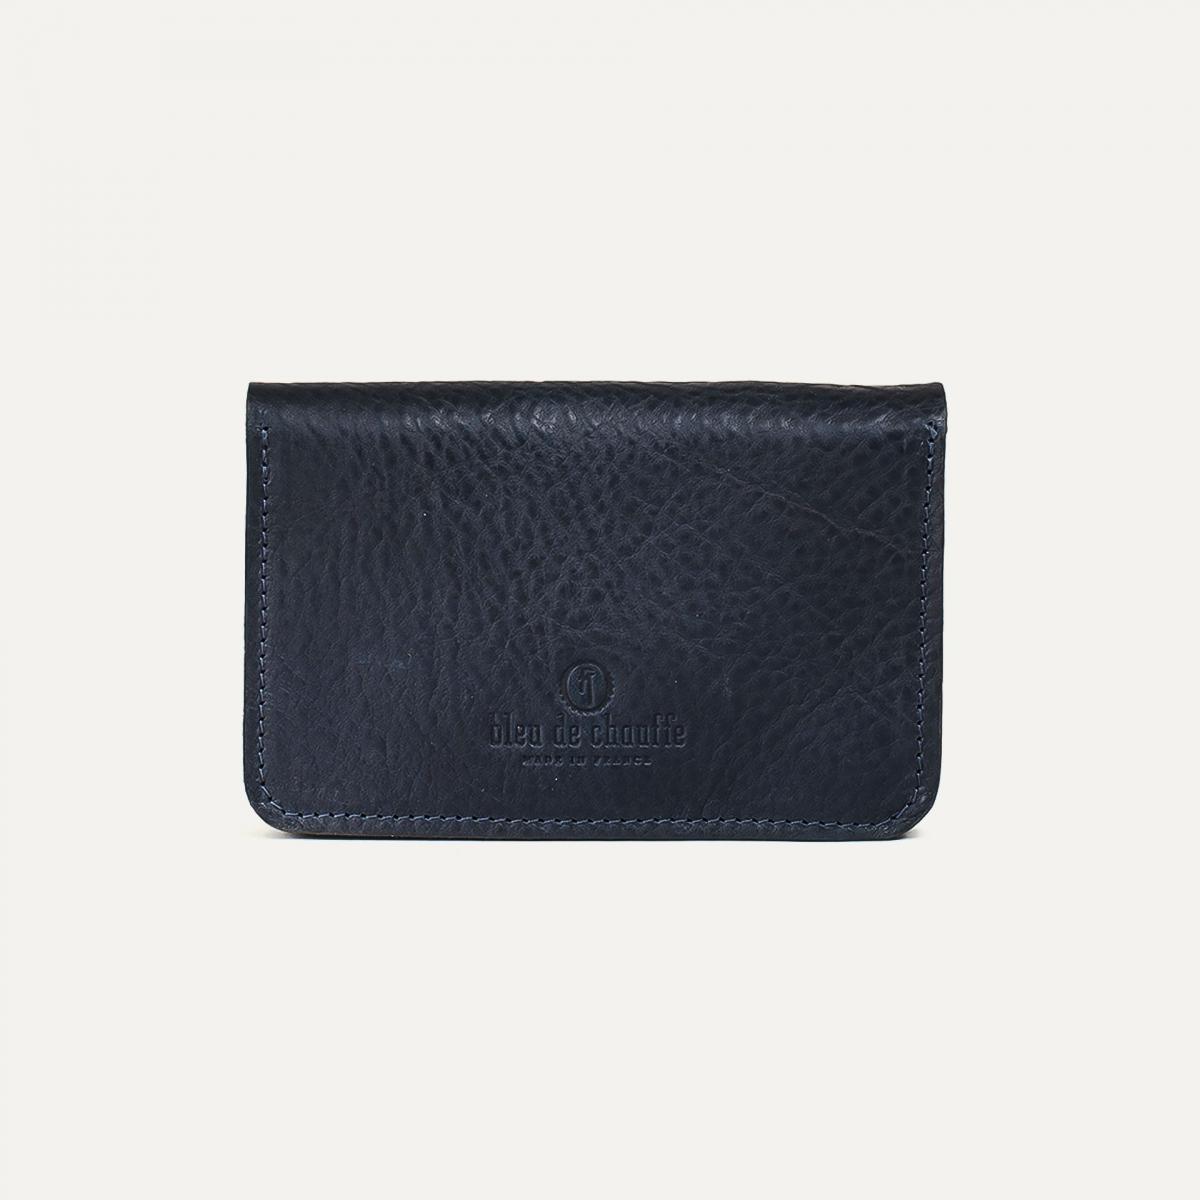 Grisbi wallet - Navy Blue (image n°2)